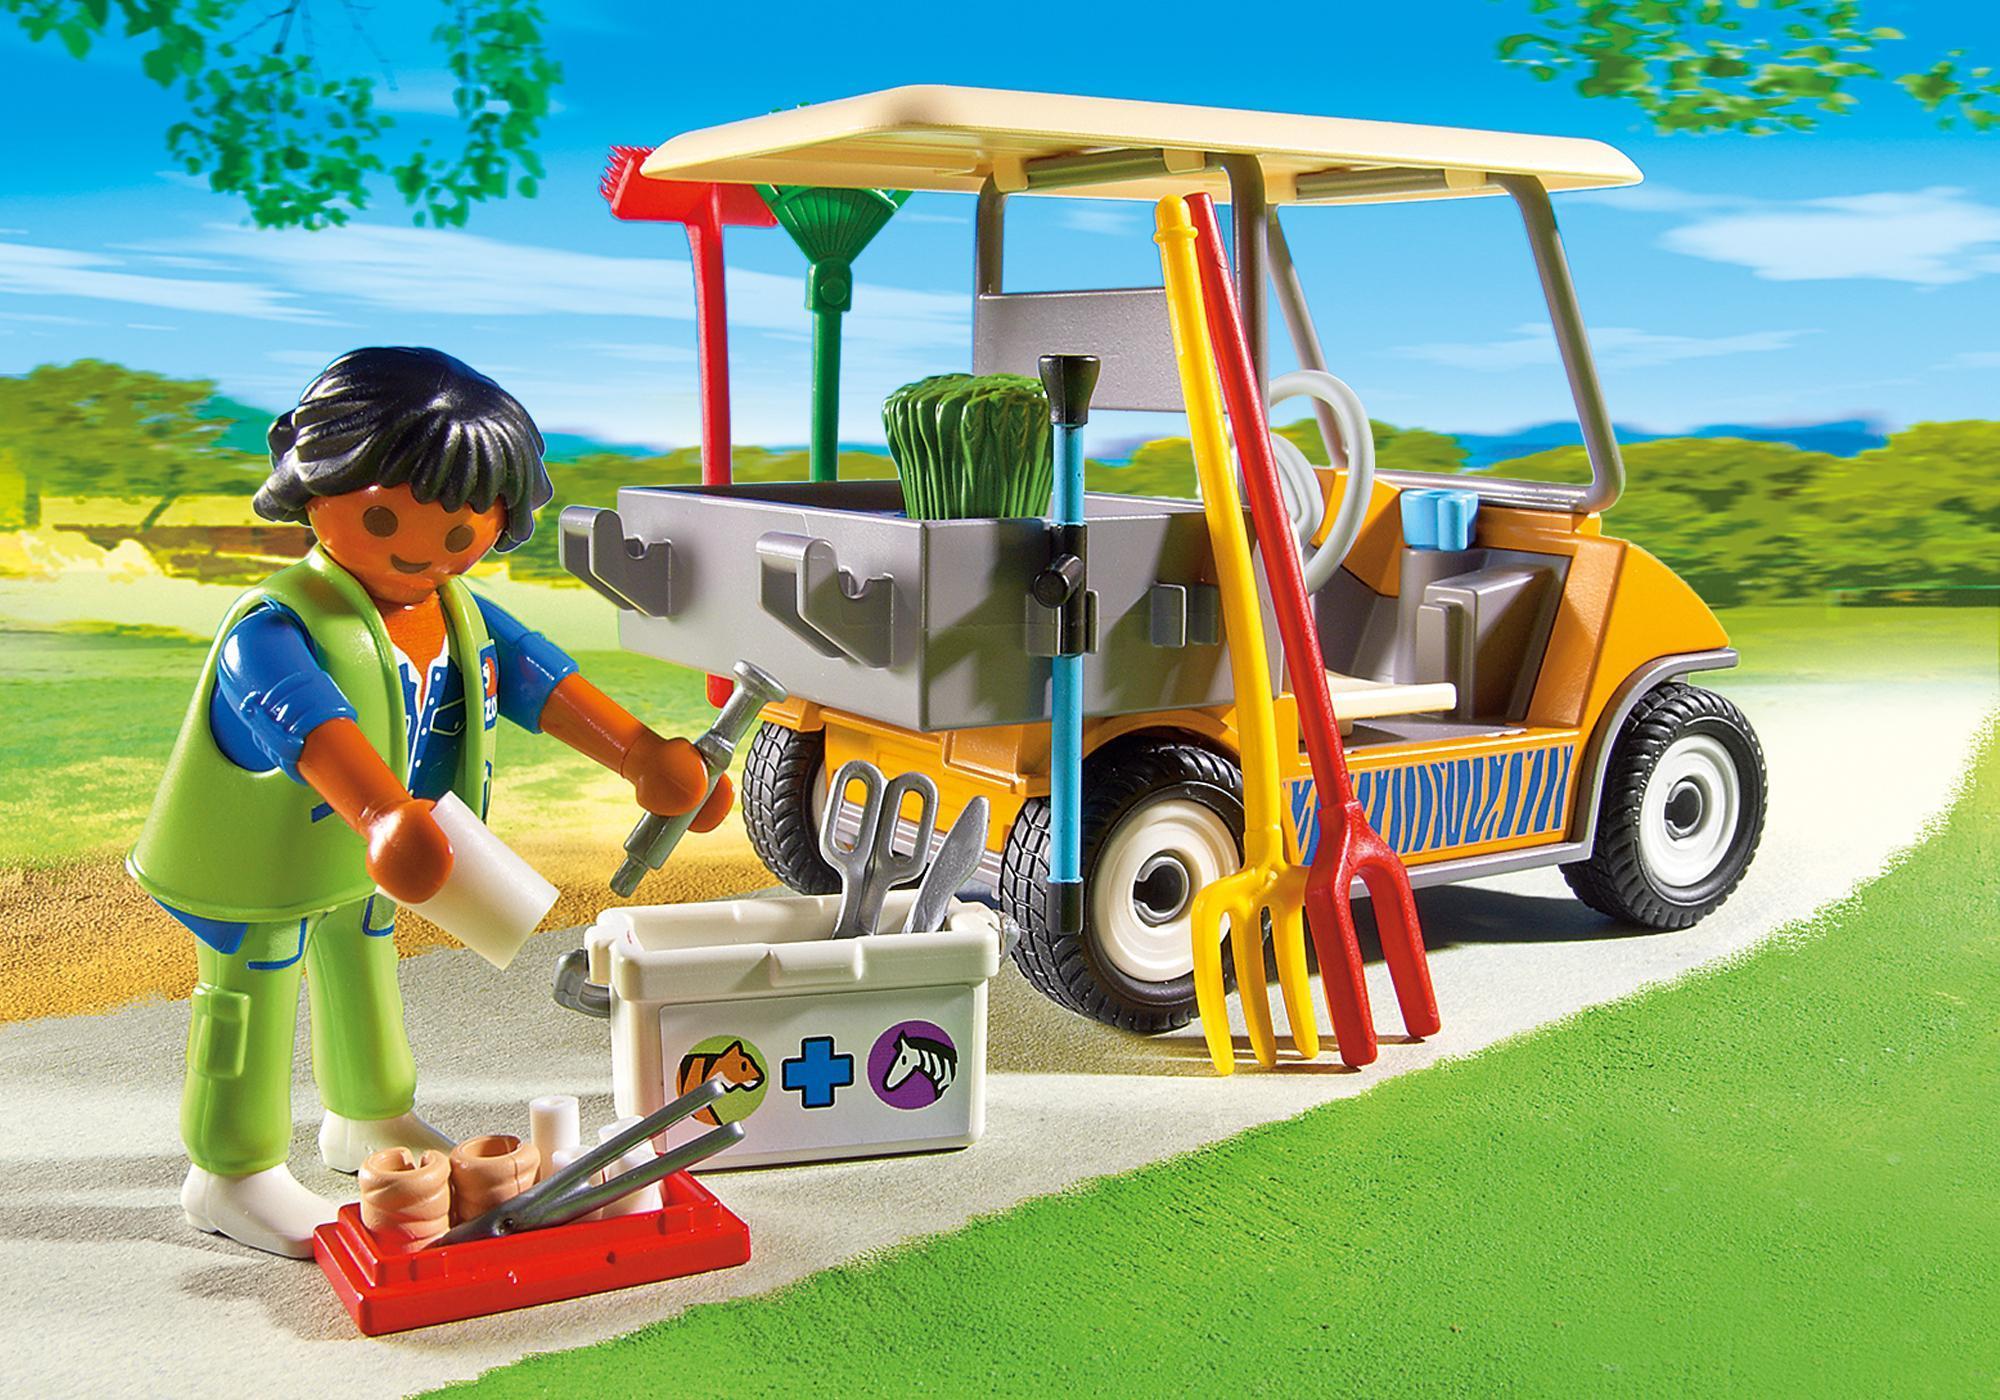 http://media.playmobil.com/i/playmobil/6636_product_extra1